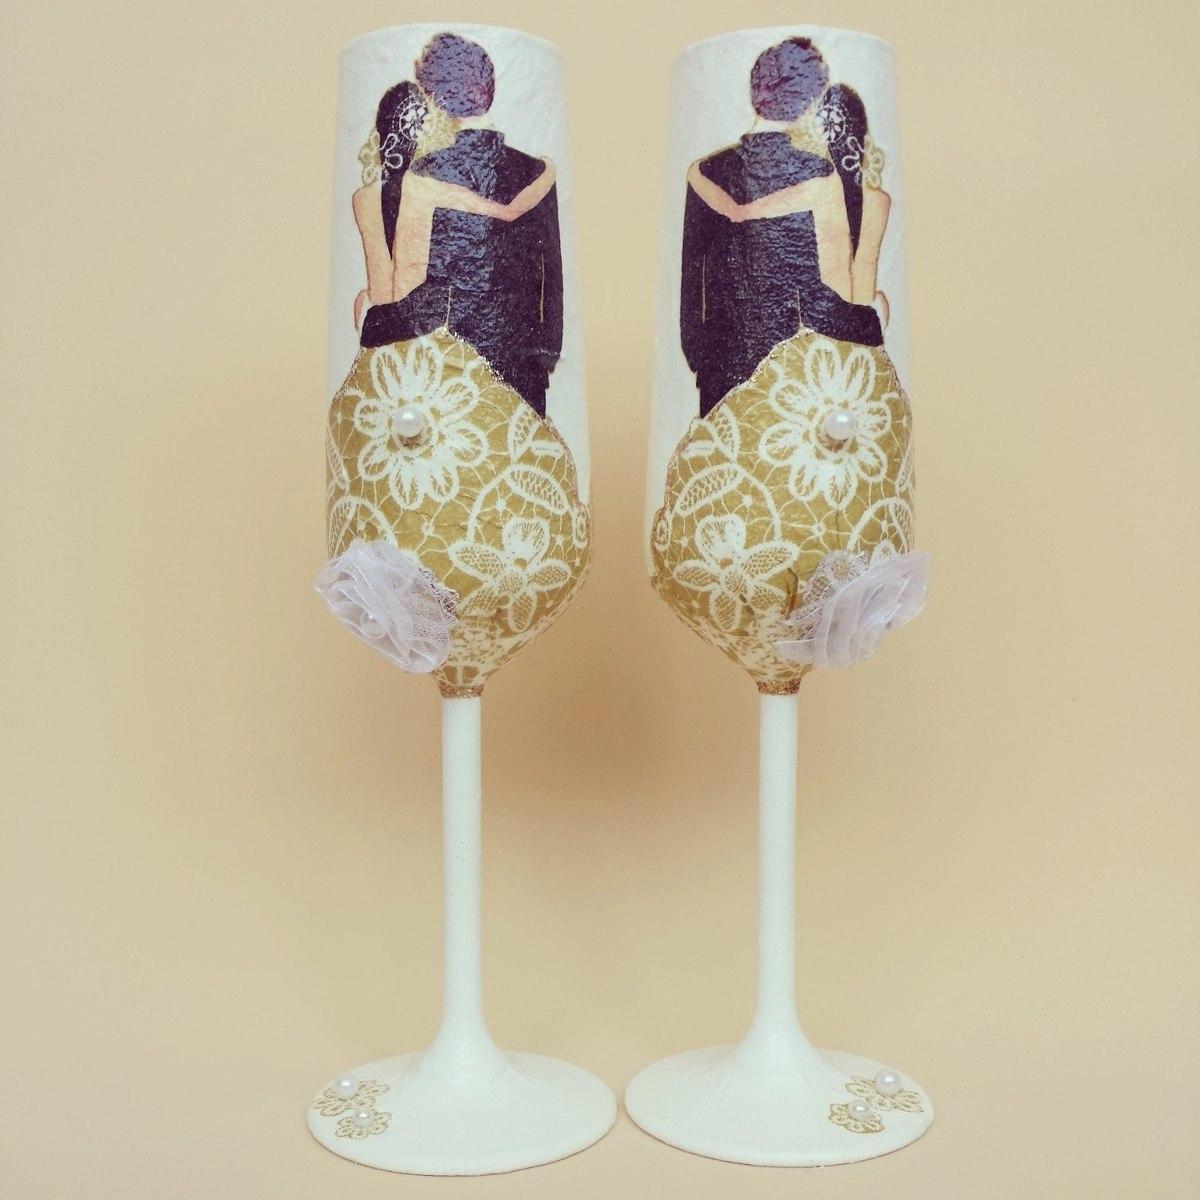 Related pictures copas novios champagne para bodas decorar for Copas de champagne